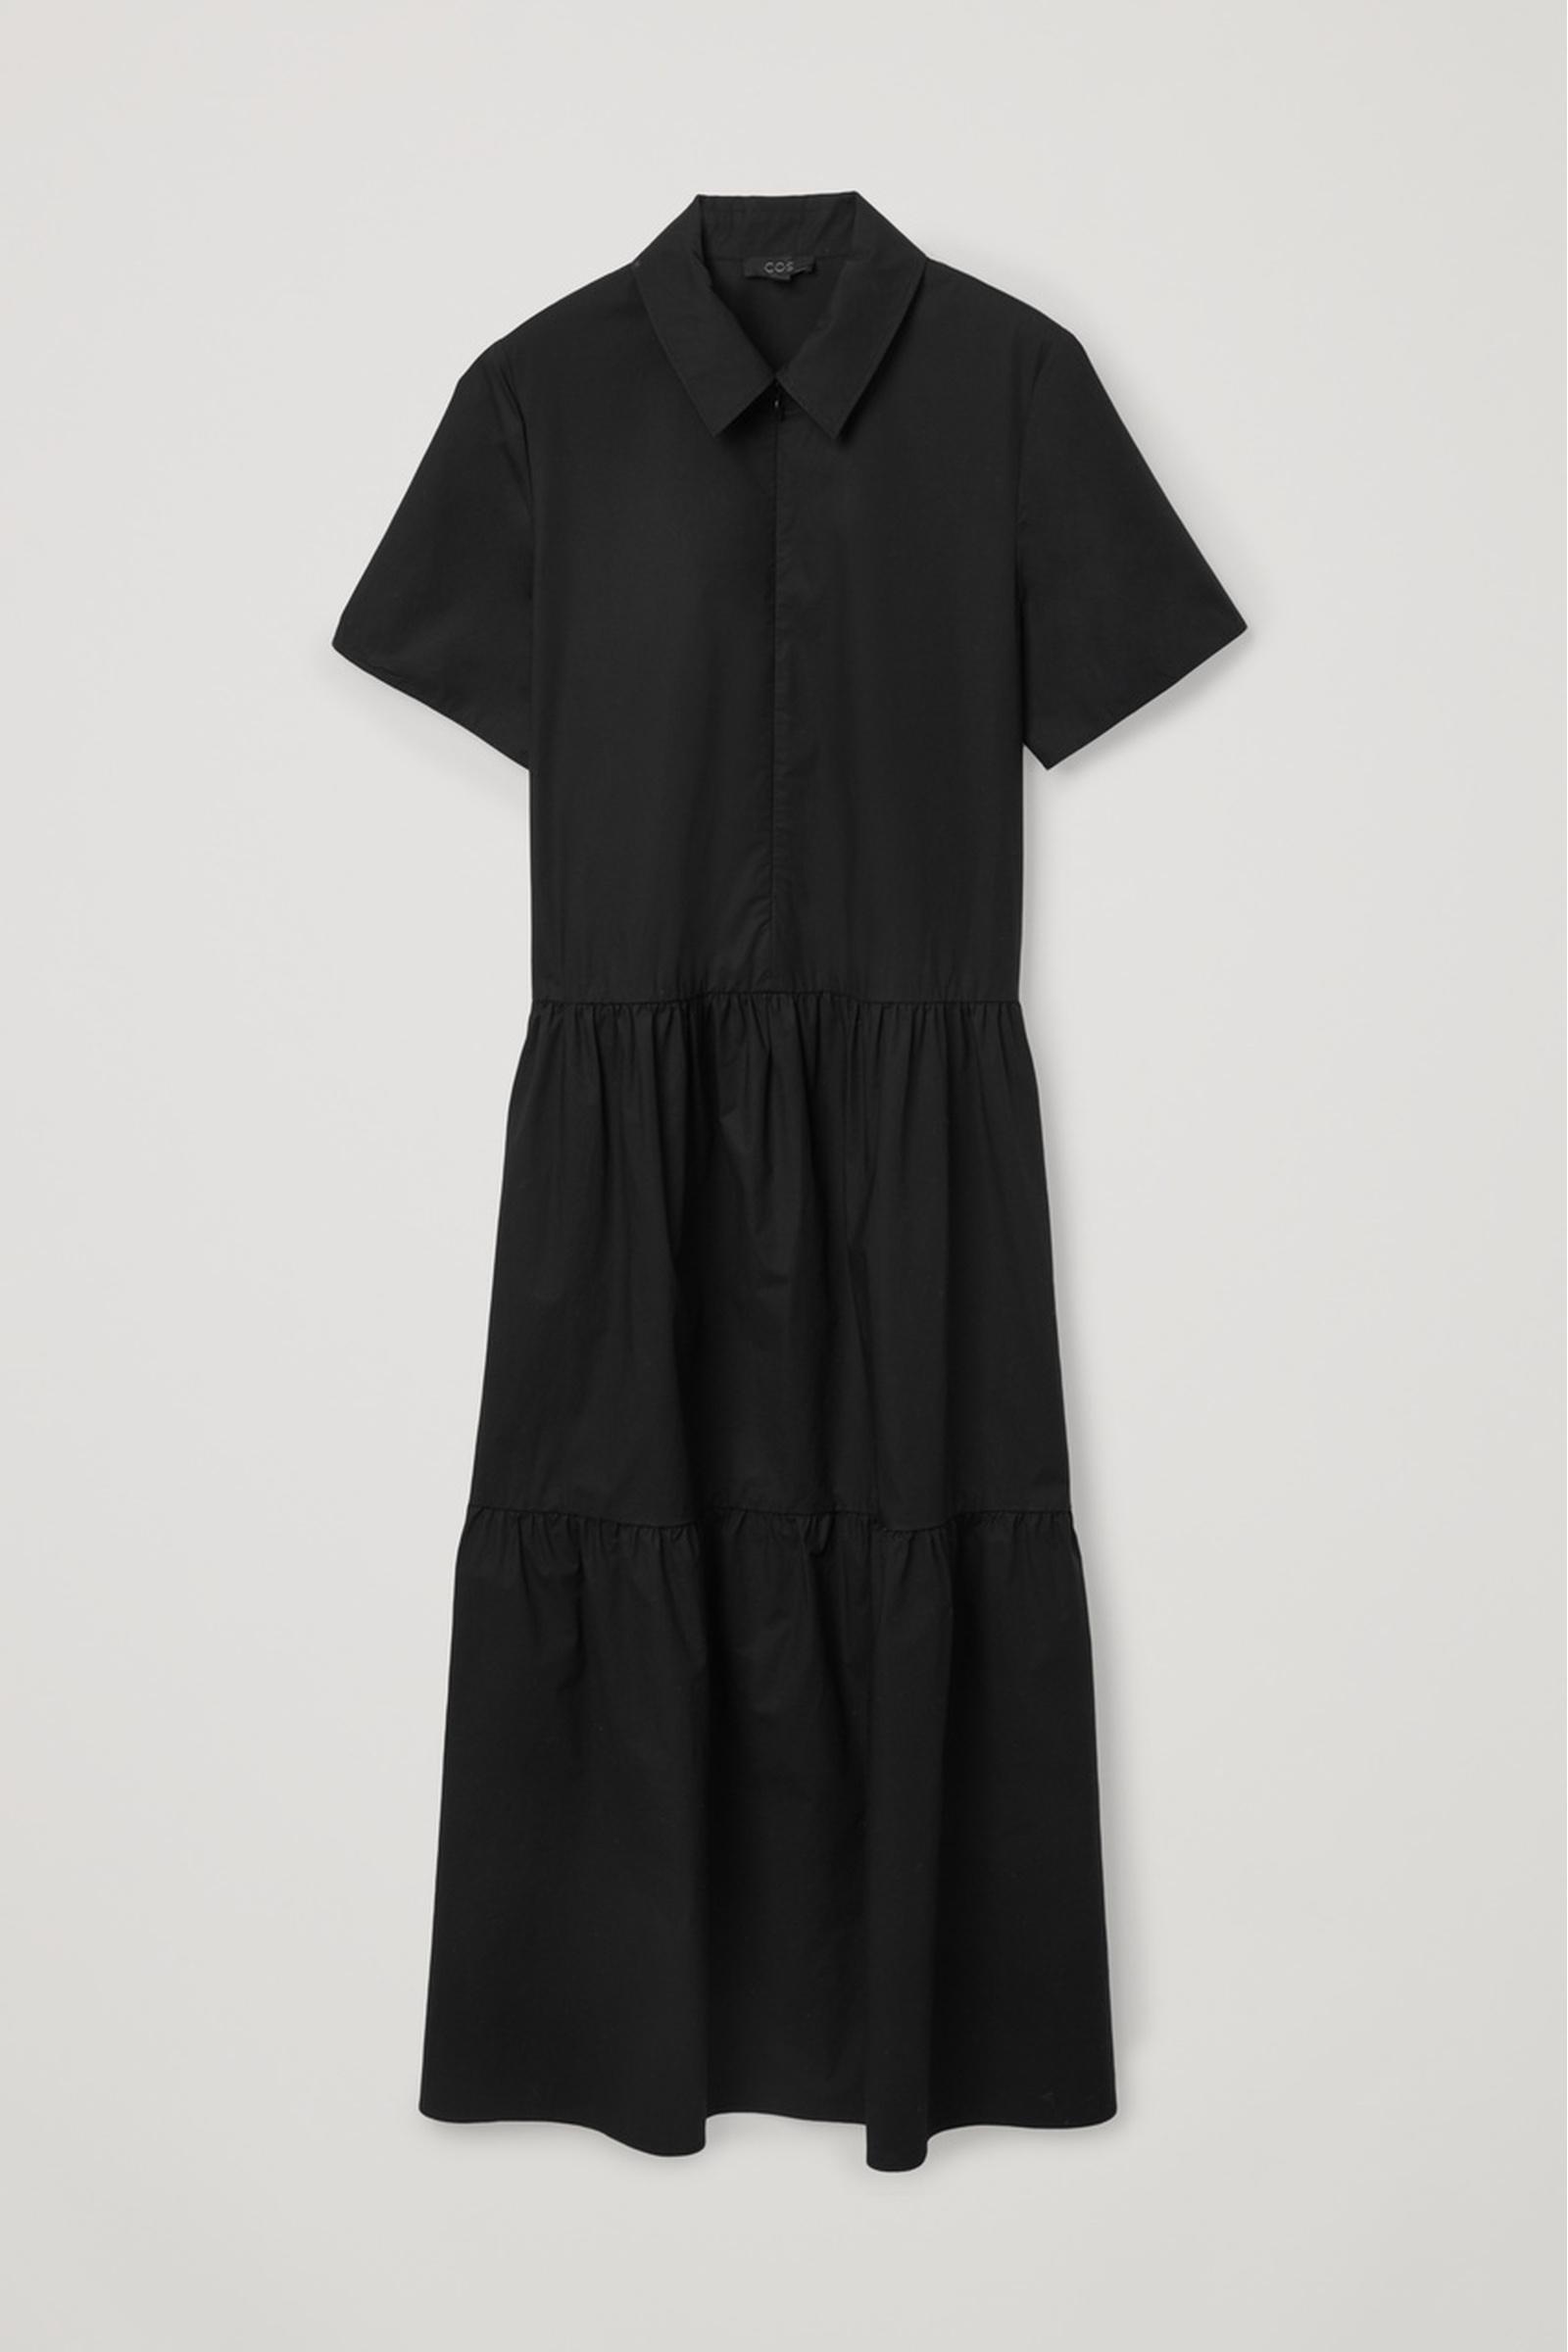 COS 개더 패널 드레스의 블랙컬러 Product입니다.